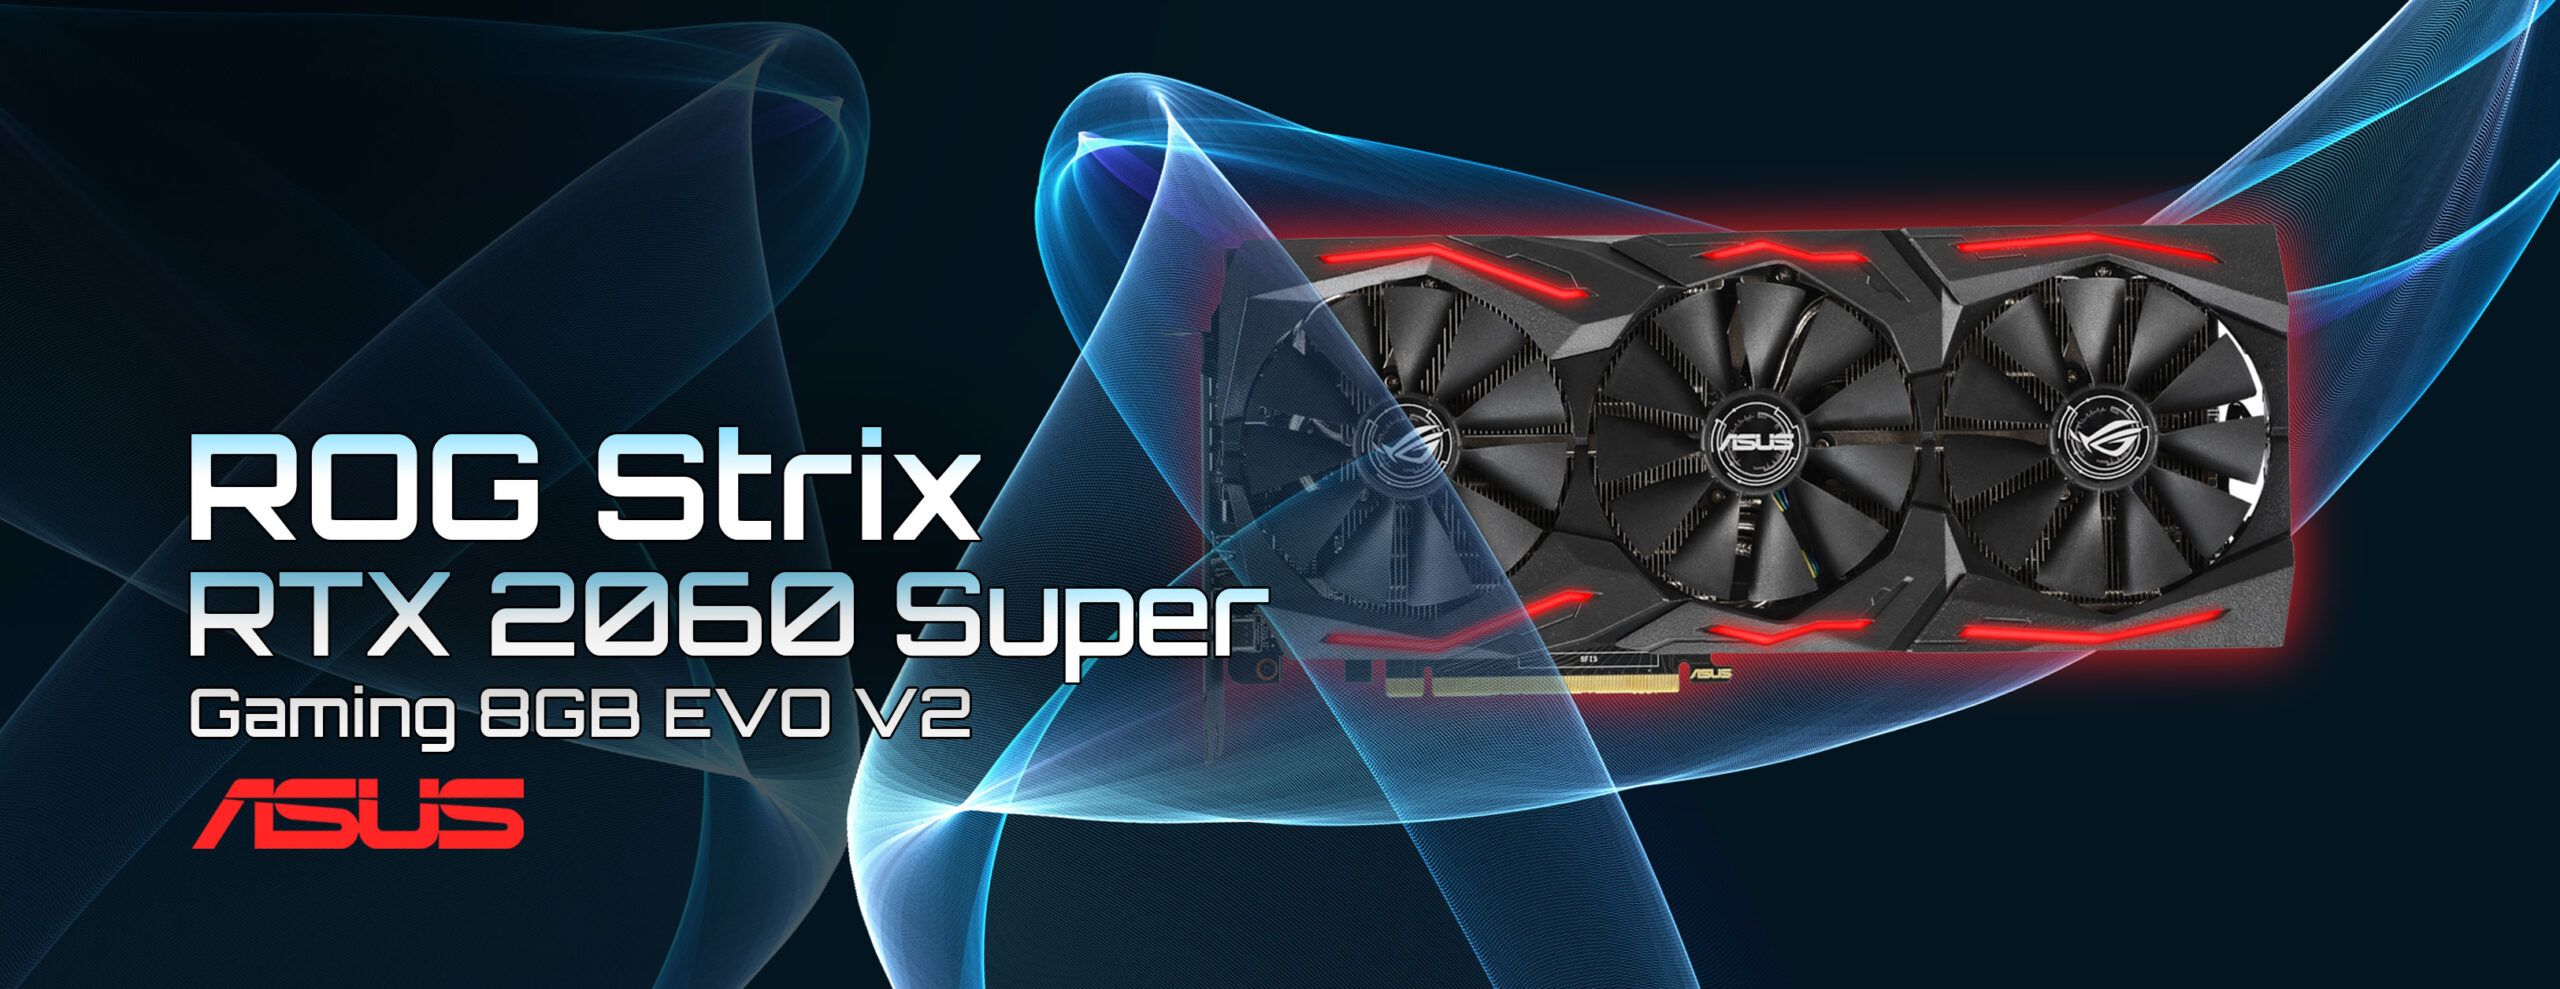 VGA  ASUS RTX-2060 Super -ROG Strix Gaming 8GB EVO V2